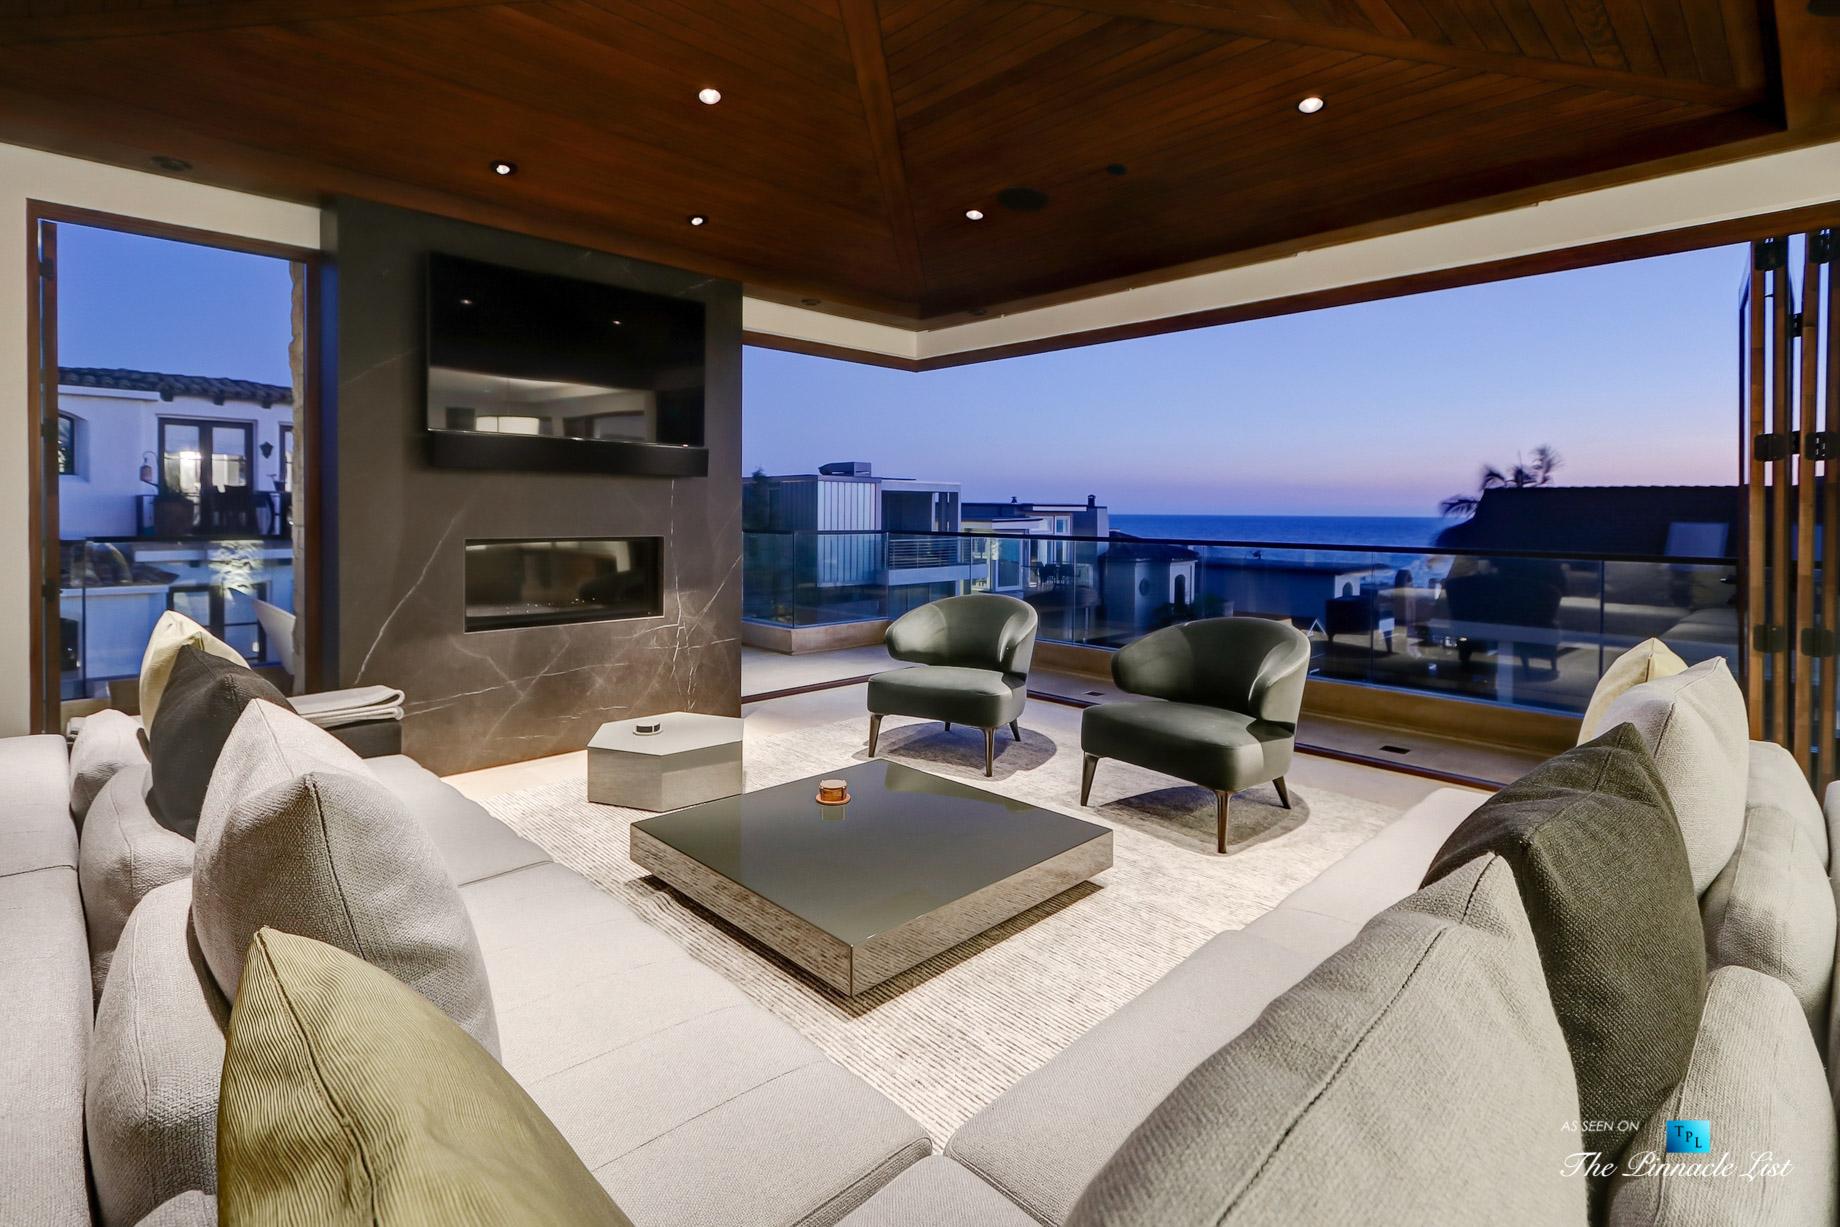 Bespoke Luxury Oceanview Residence - 205 20th St, Manhattan Beach, CA, USA - Night Living Room